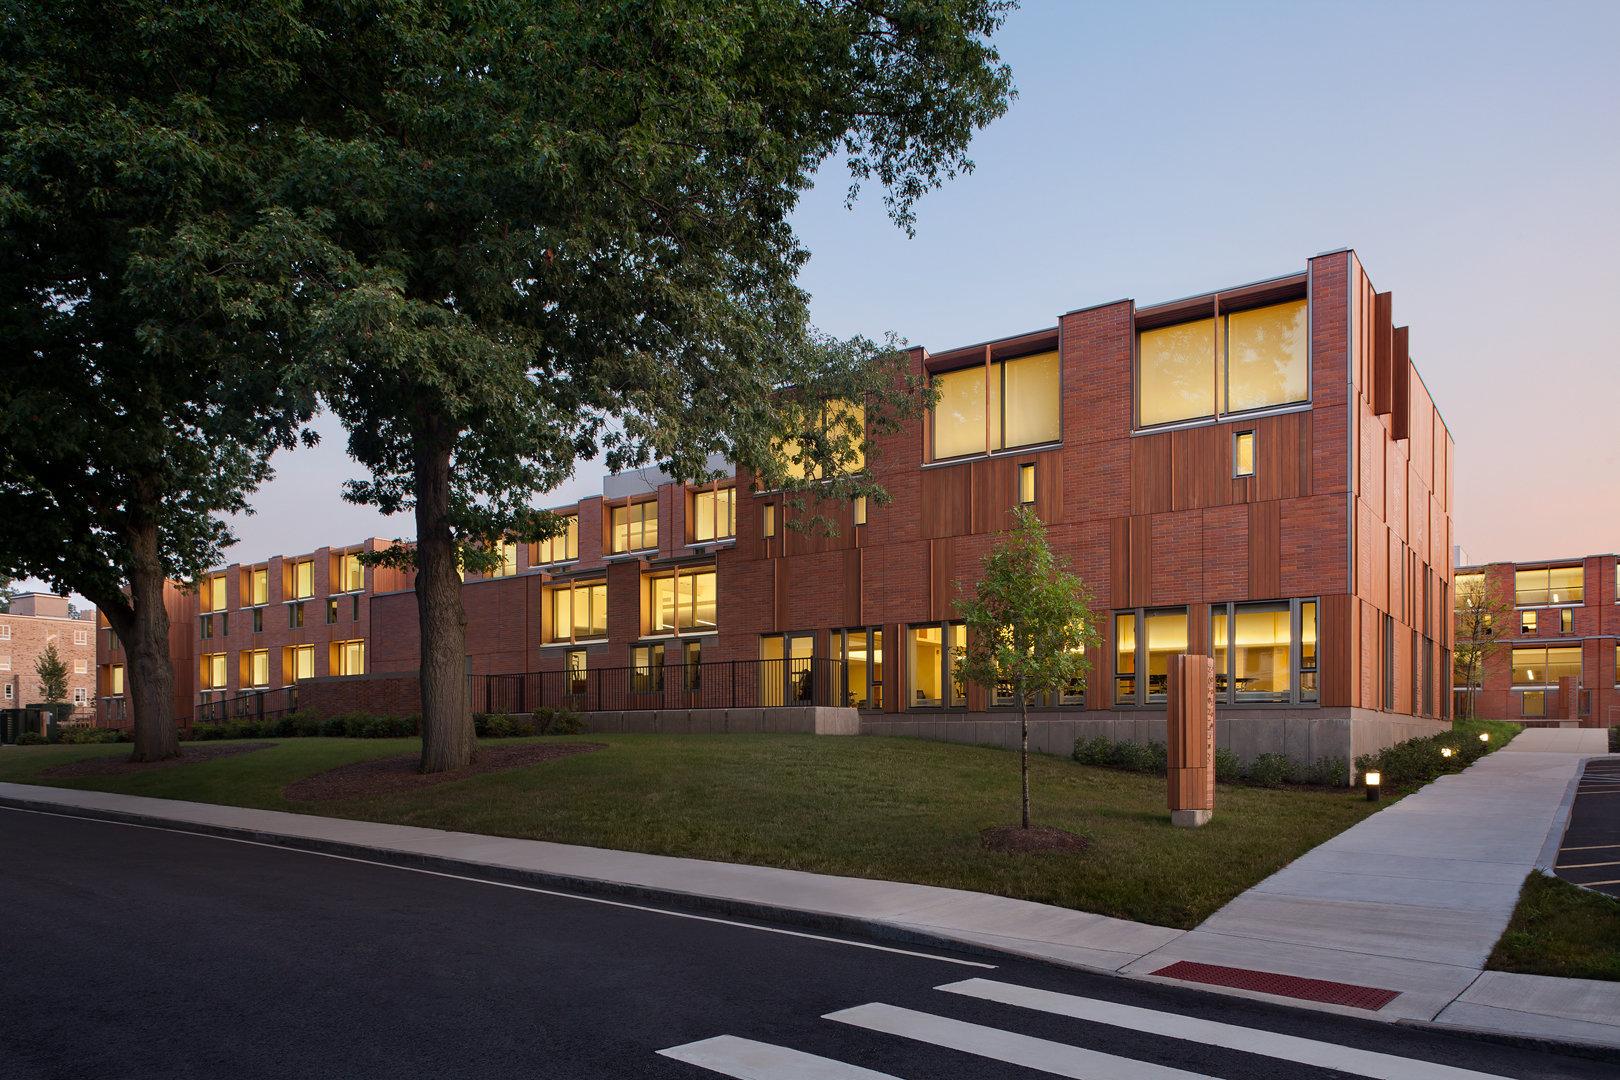 The Roger E. Wellington Elementary School